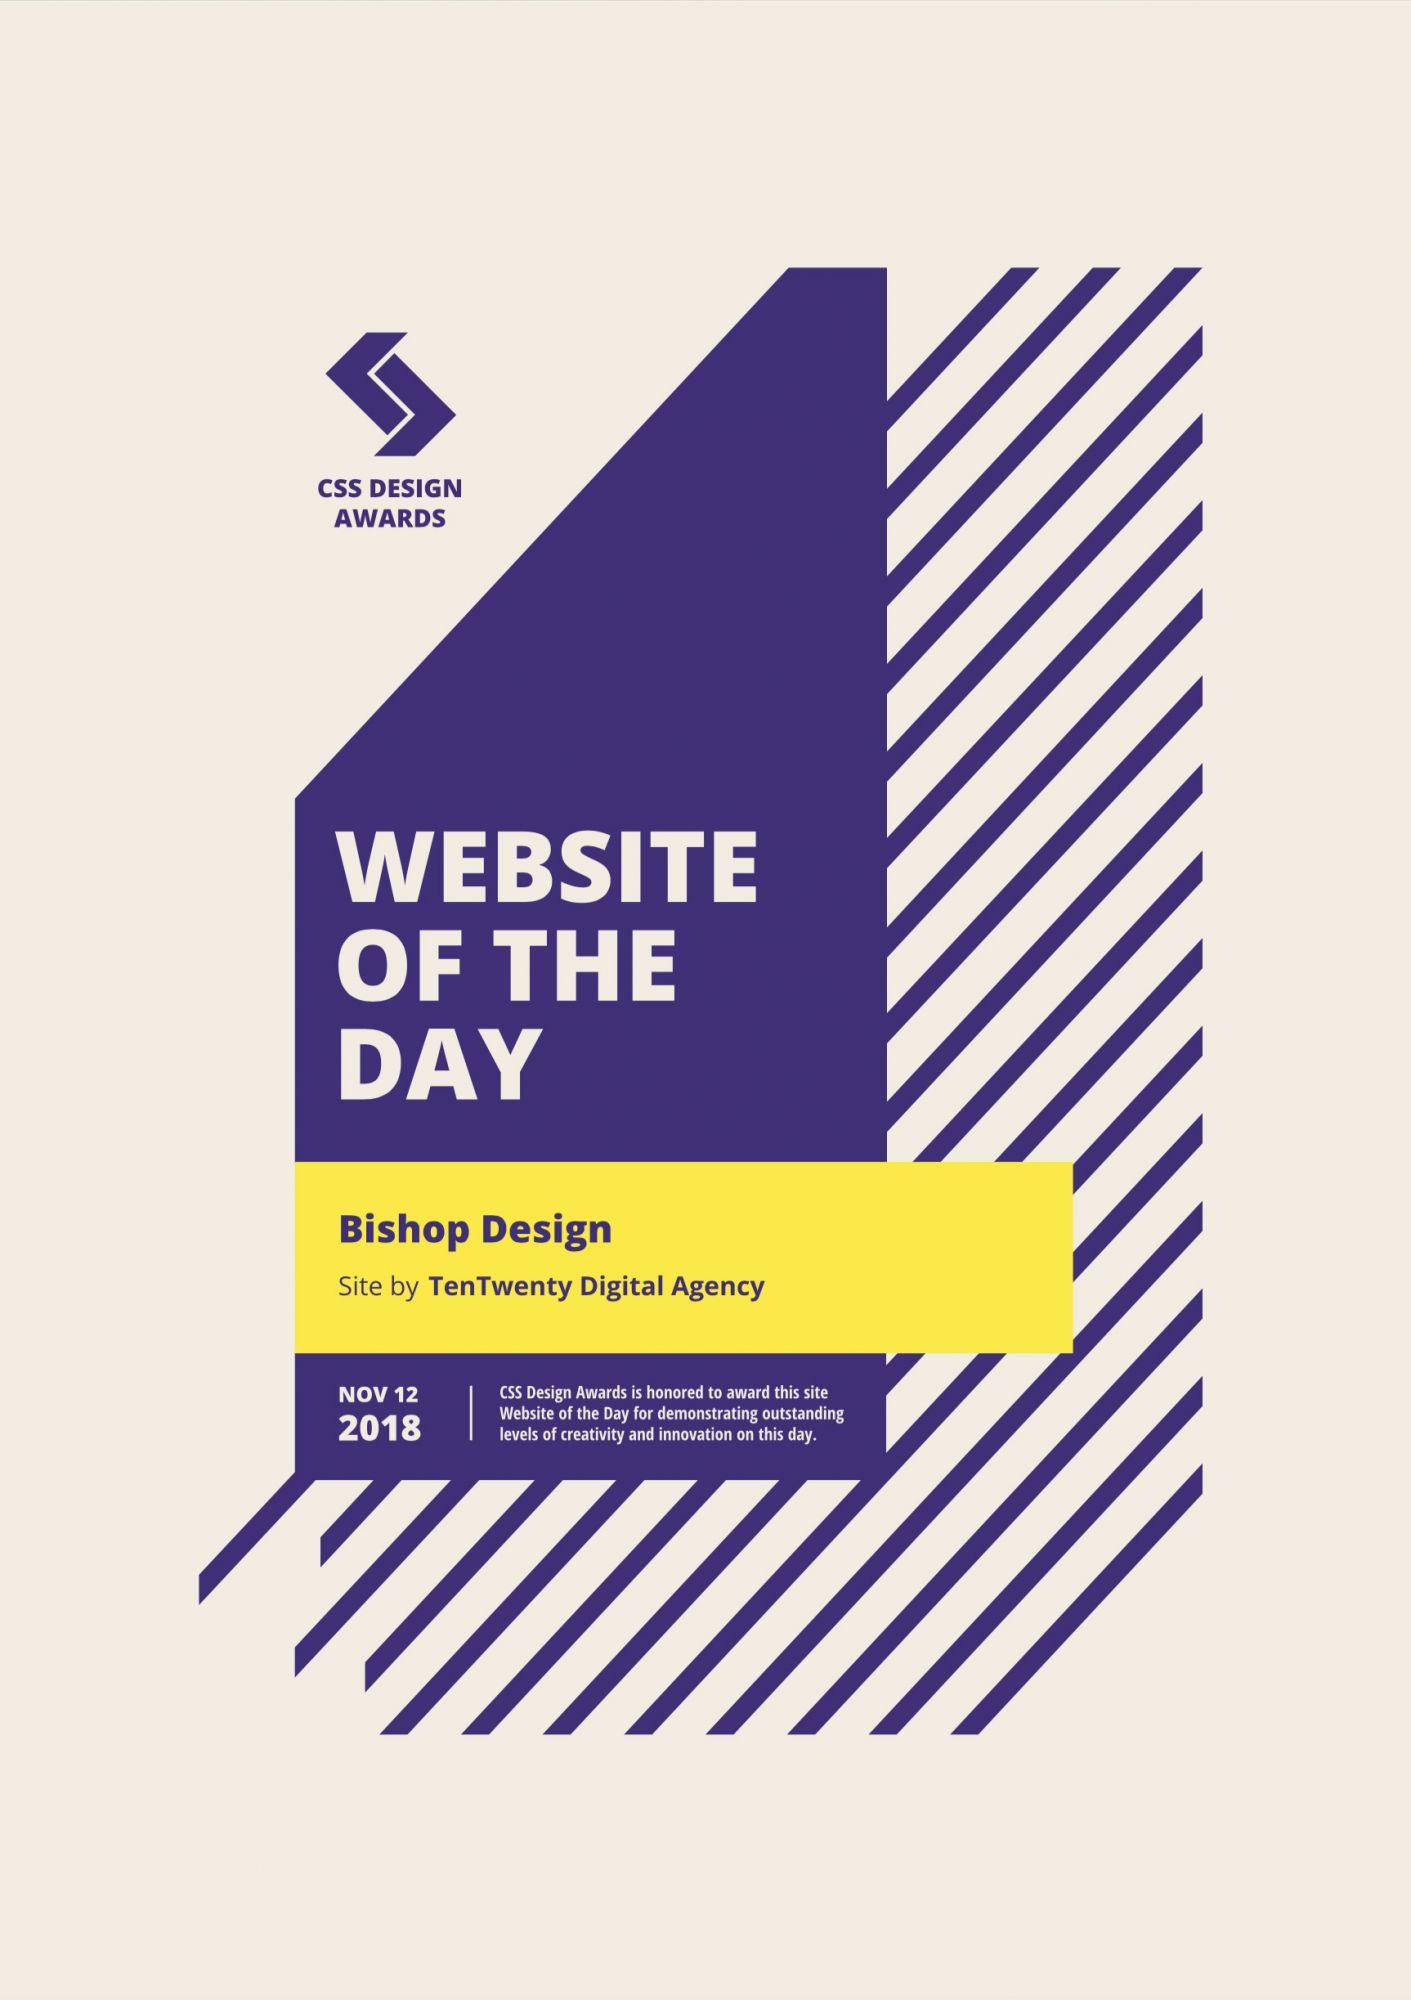 Bishop-Design-Website-of-the-Day-12112018.jpg